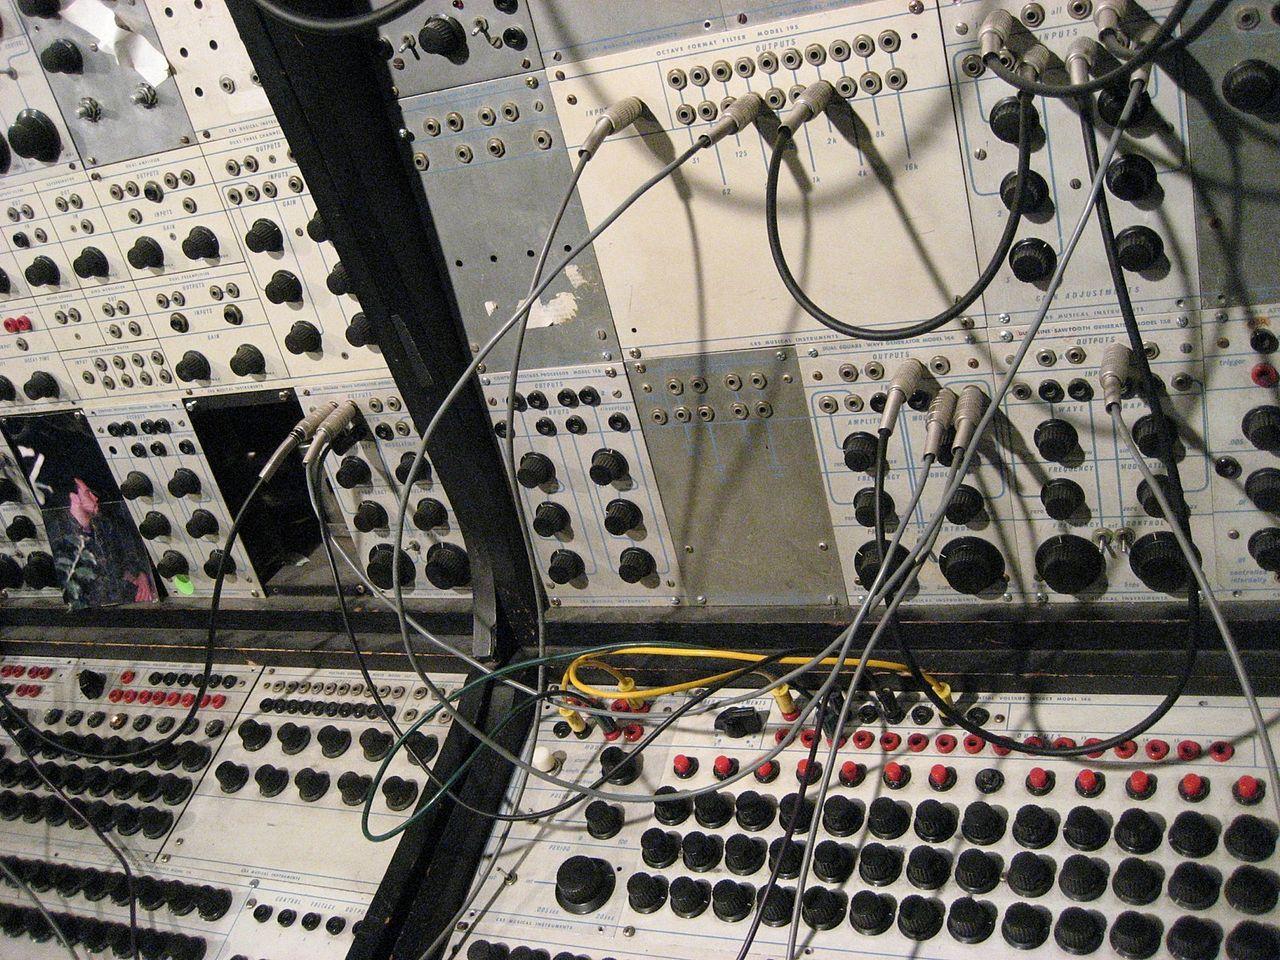 Ingram Marshall I Sine Waves And Tape Loops Meet The Composer Wqxr Recording Studio Wiring